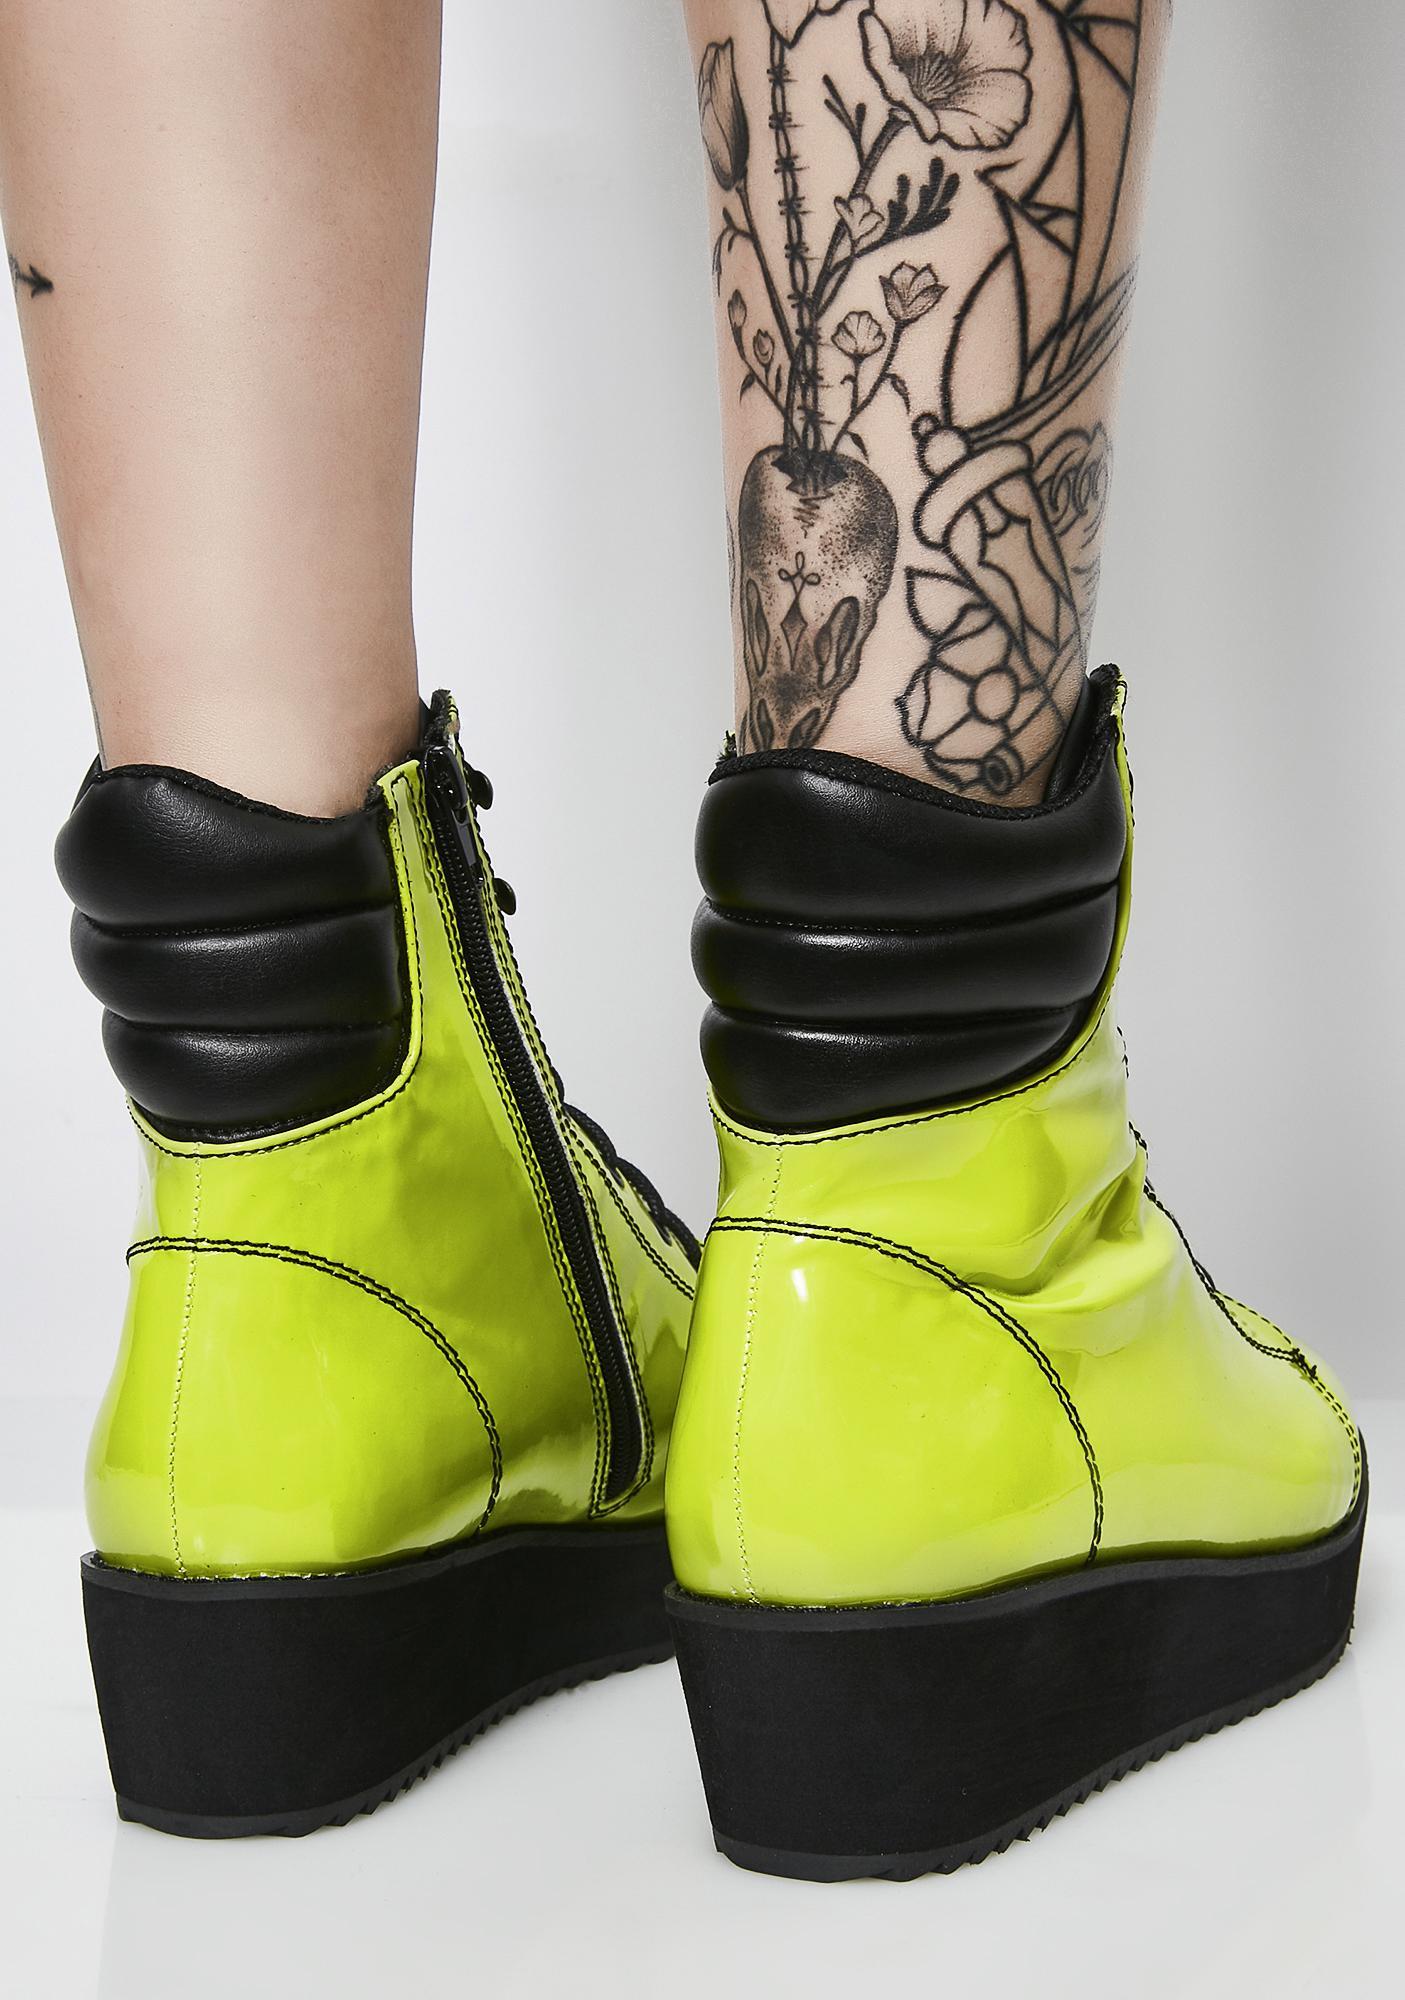 Strange Cvlt Neon Darby Boots